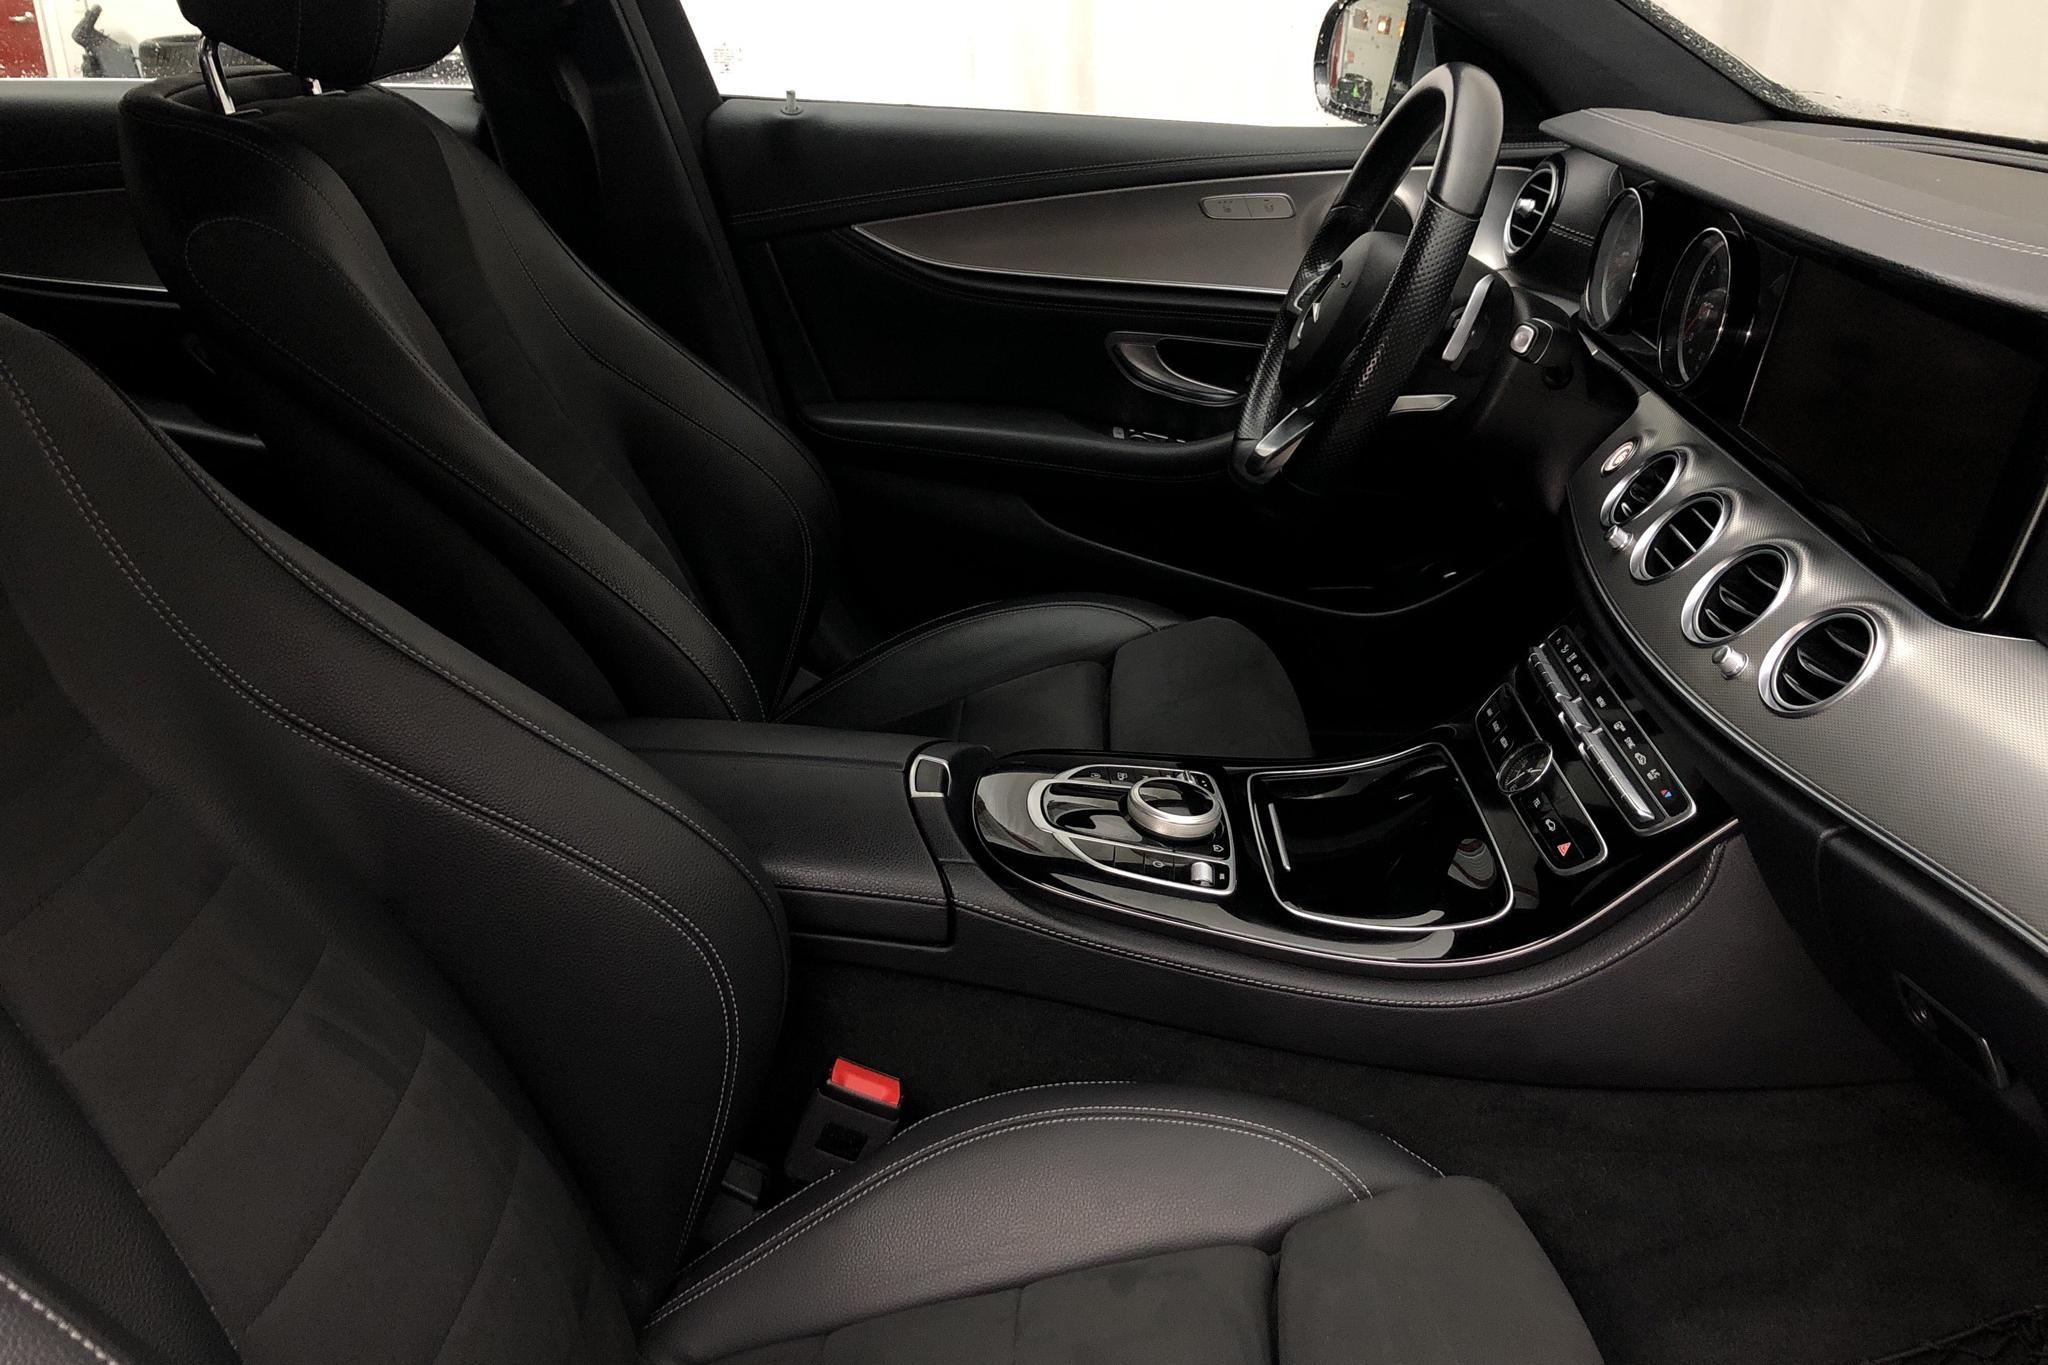 Mercedes E 220 d Sedan W213 (194hk) - 80 810 km - Automatic - gray - 2018